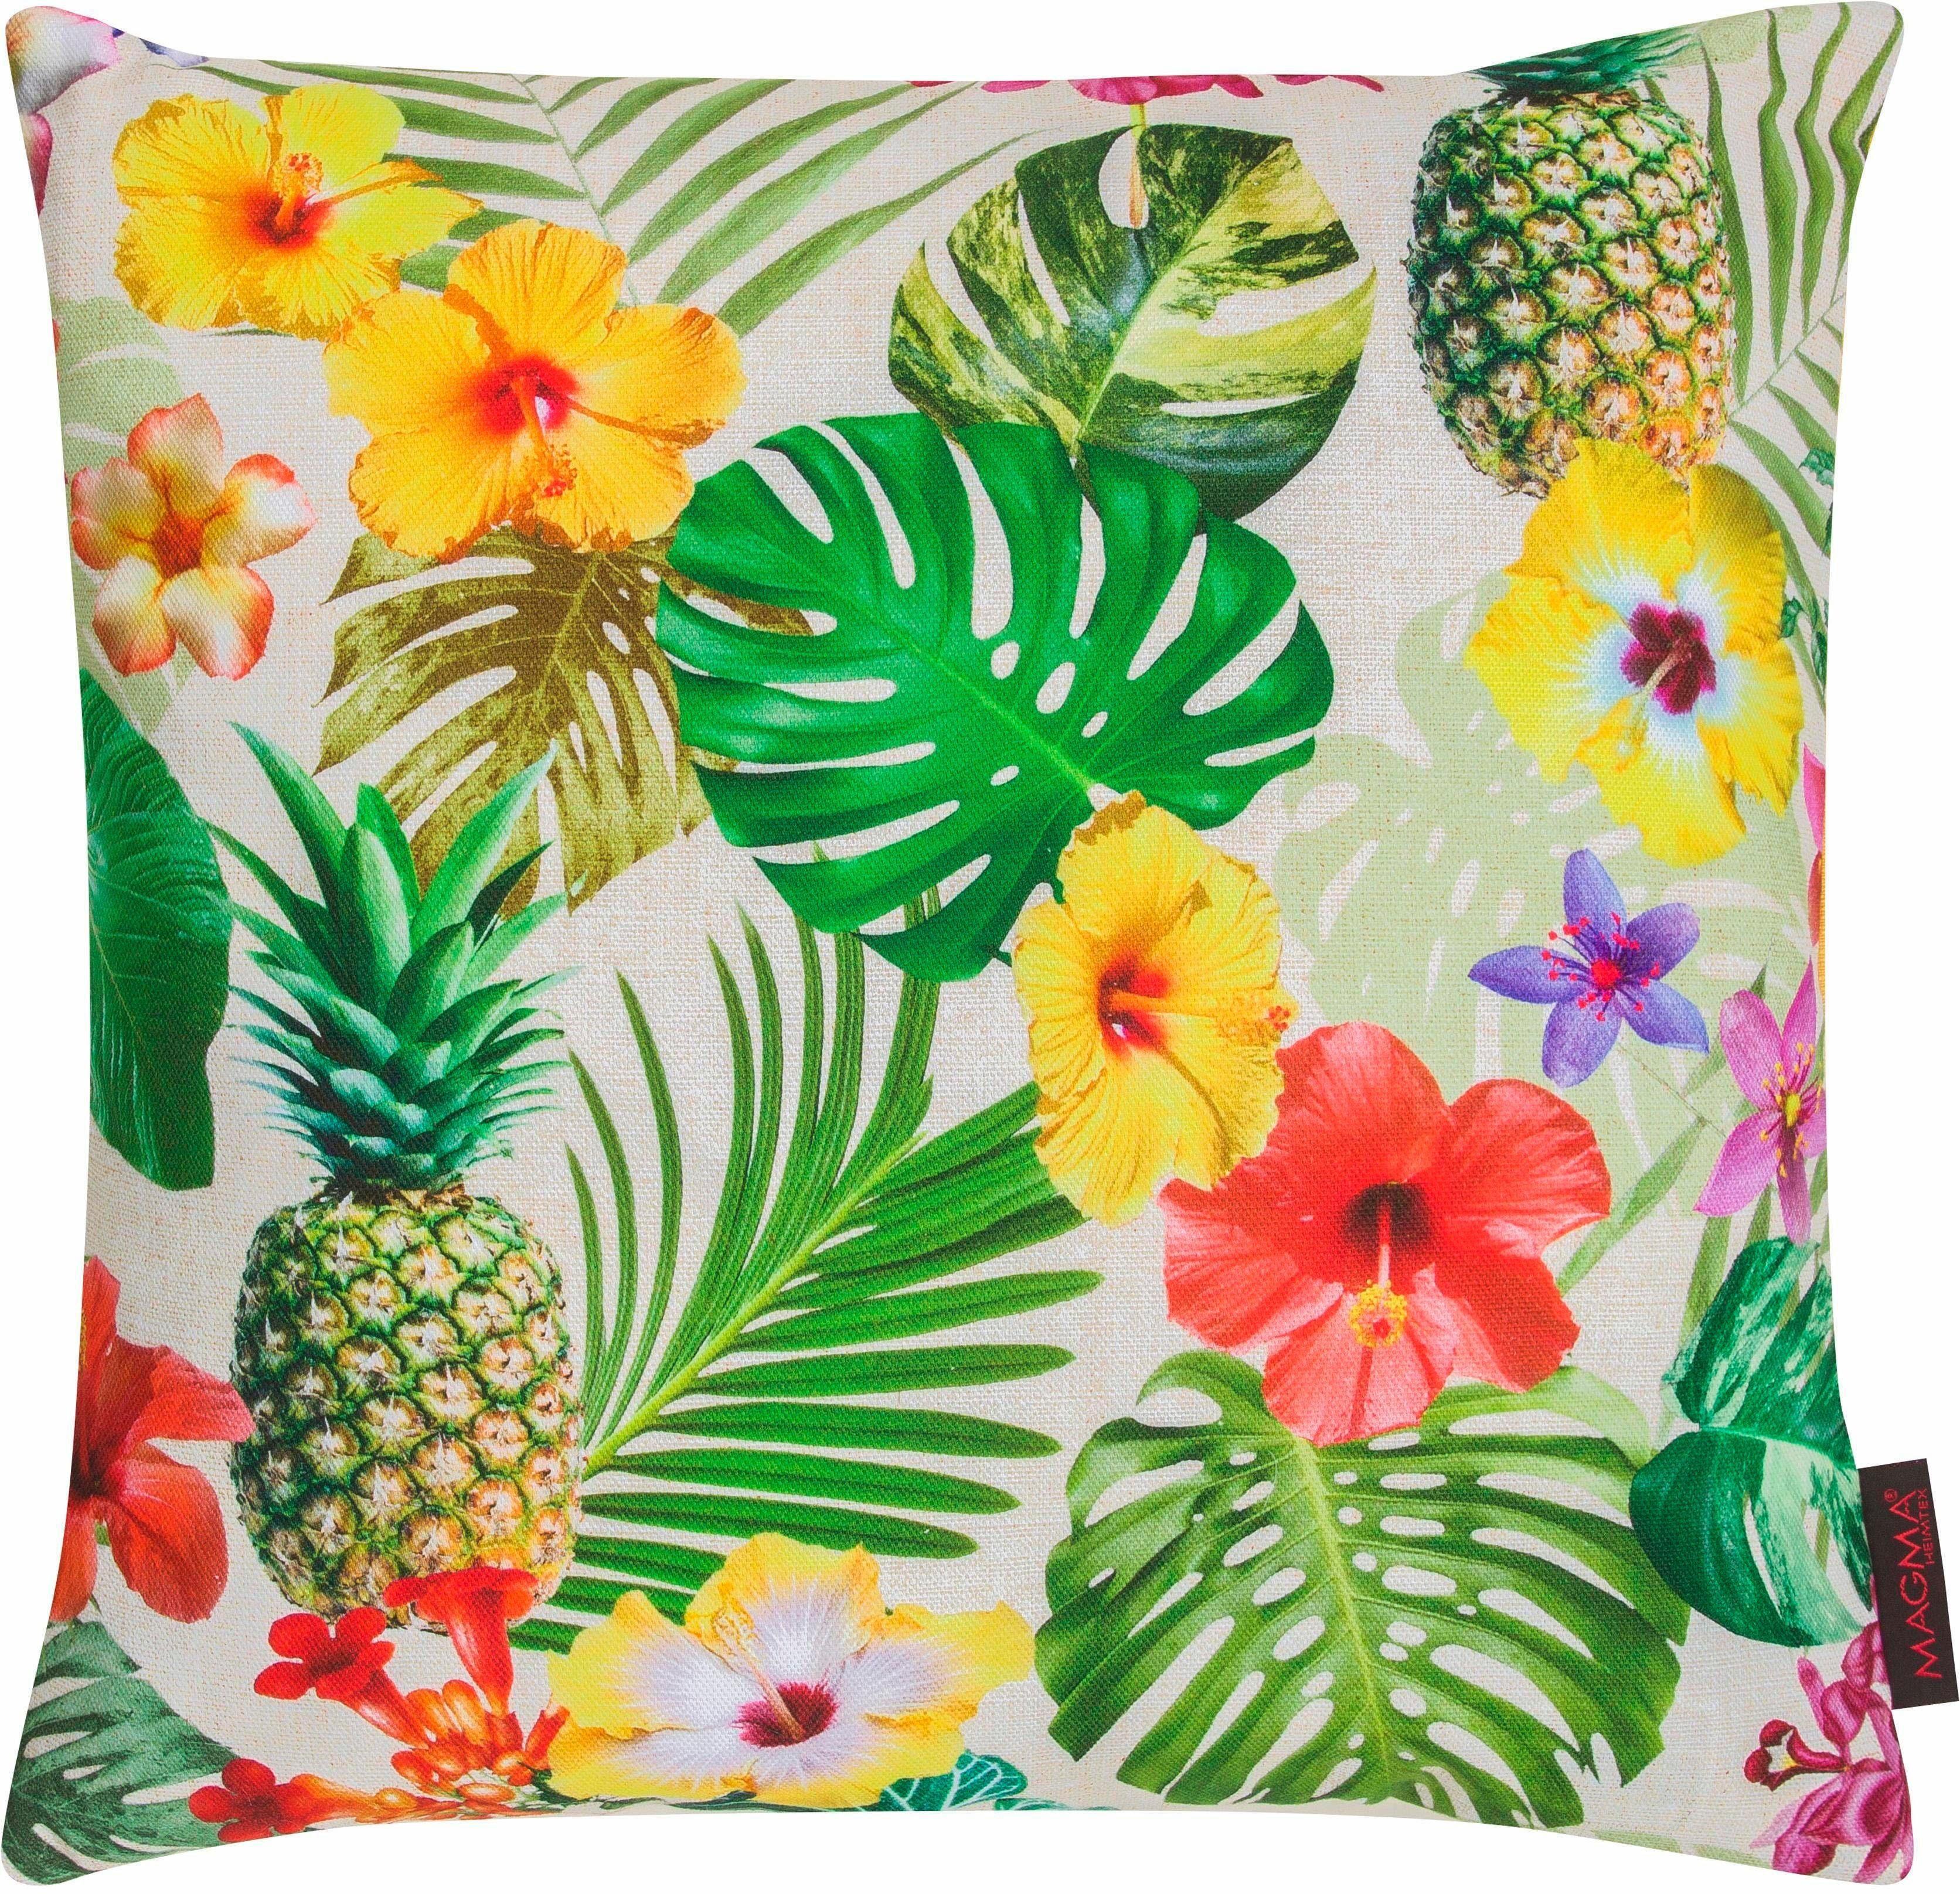 Kissenhülle, Magma Heimtex, »Tropical«, mit Ananas Motiv